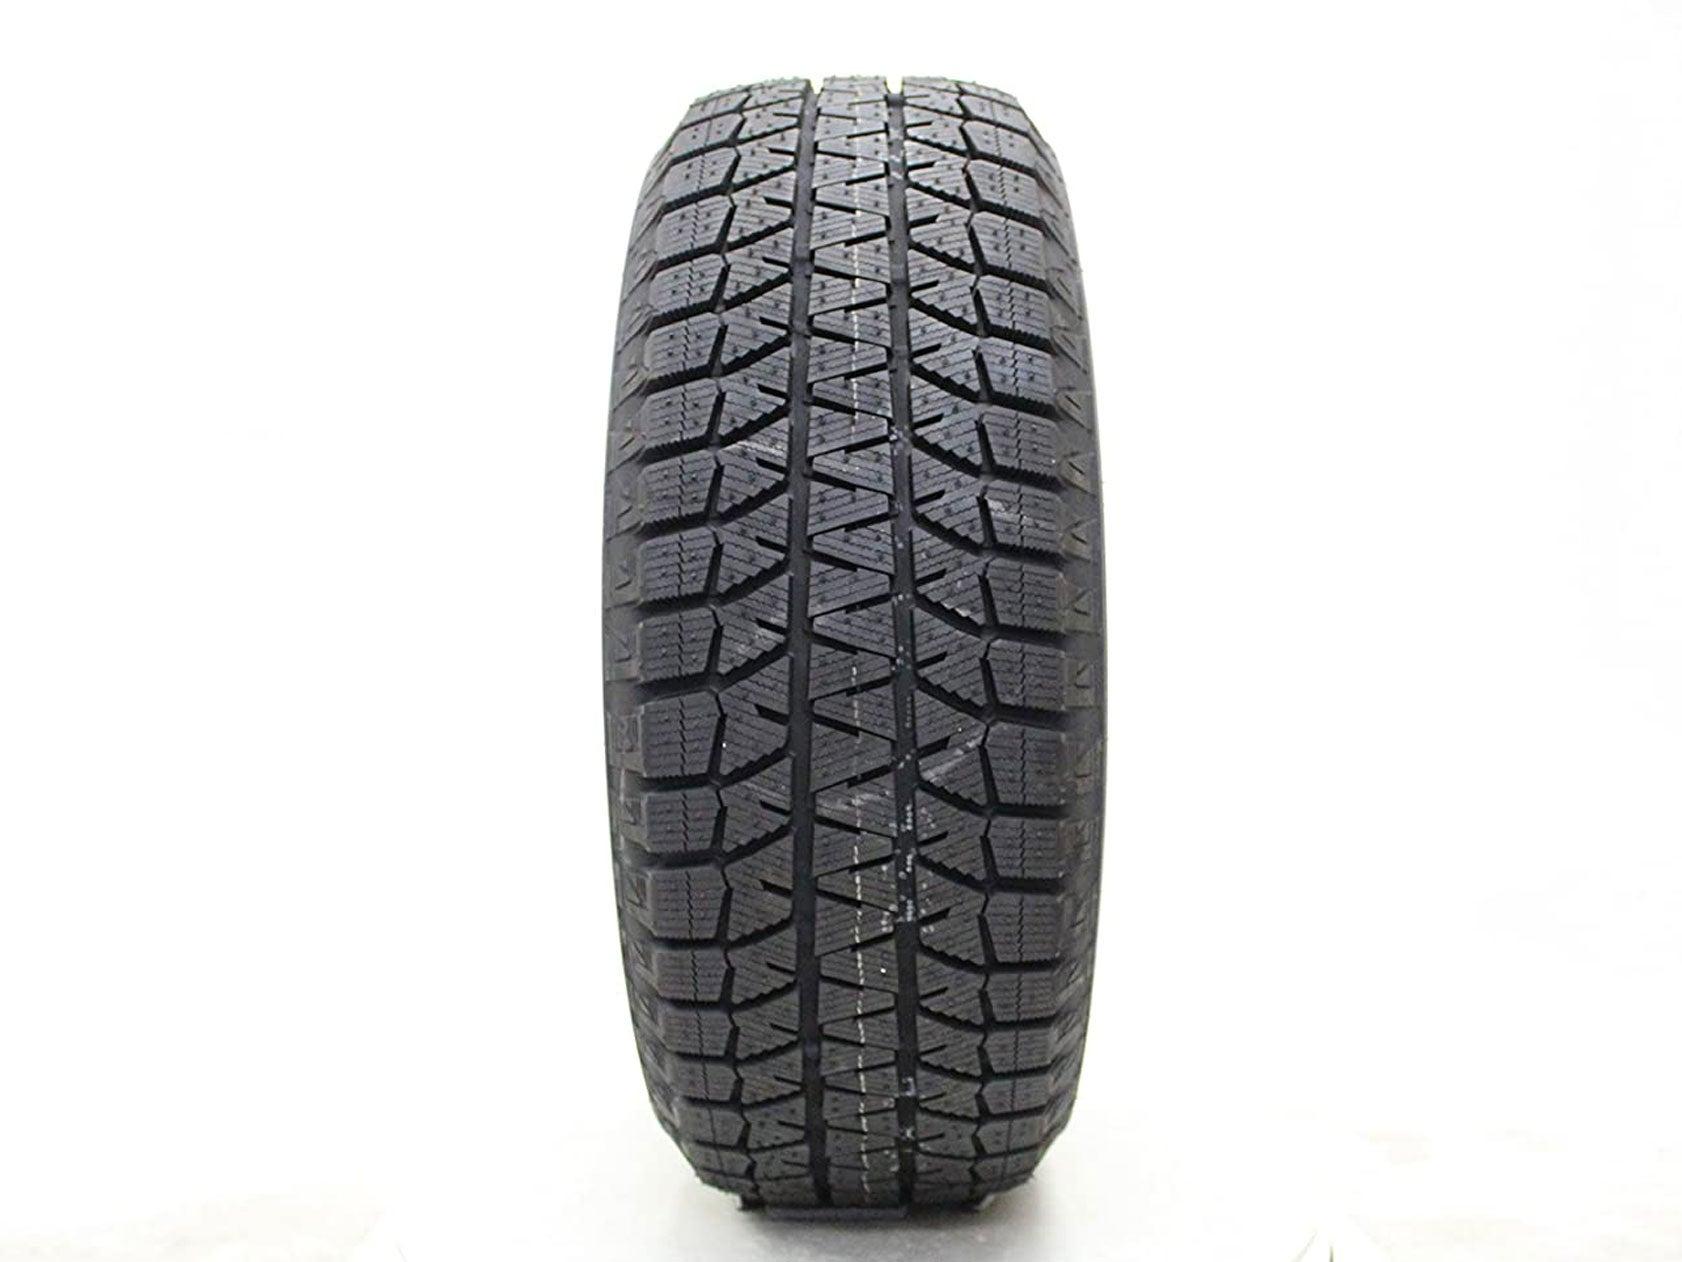 Bridgestone Blizzak Winter/Snow Passenger Tire